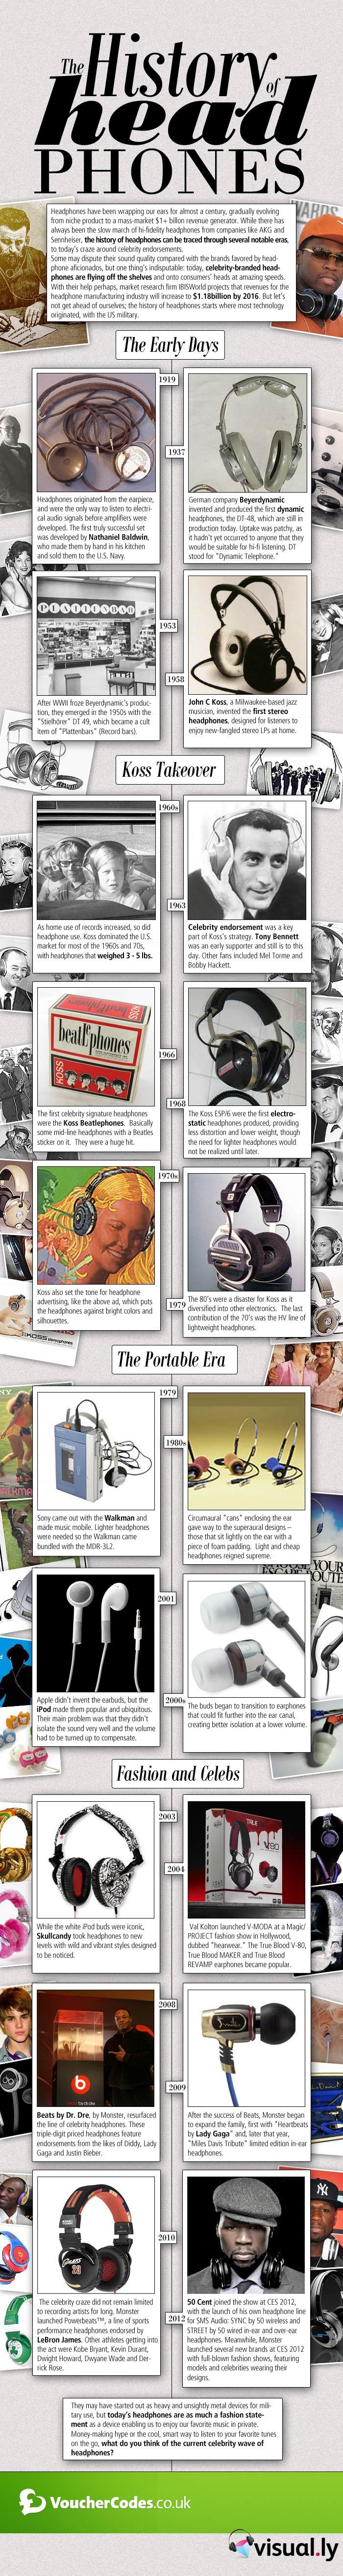 the-history-of-headphones_502914ea8134f